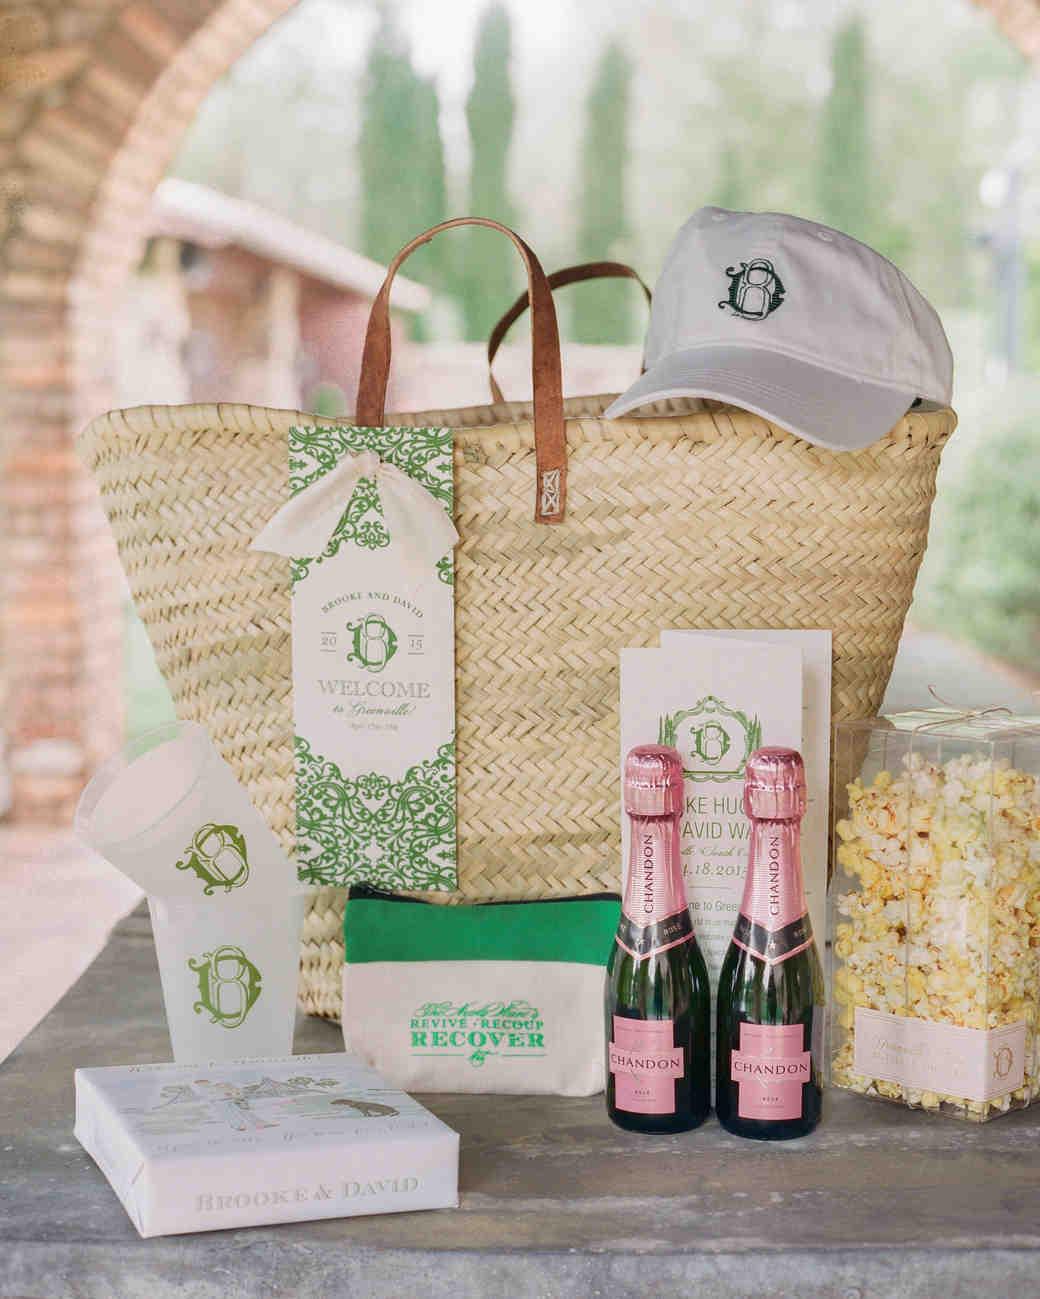 brooke-david-south-carolina-wedding-welcome-basket-102803722_vert